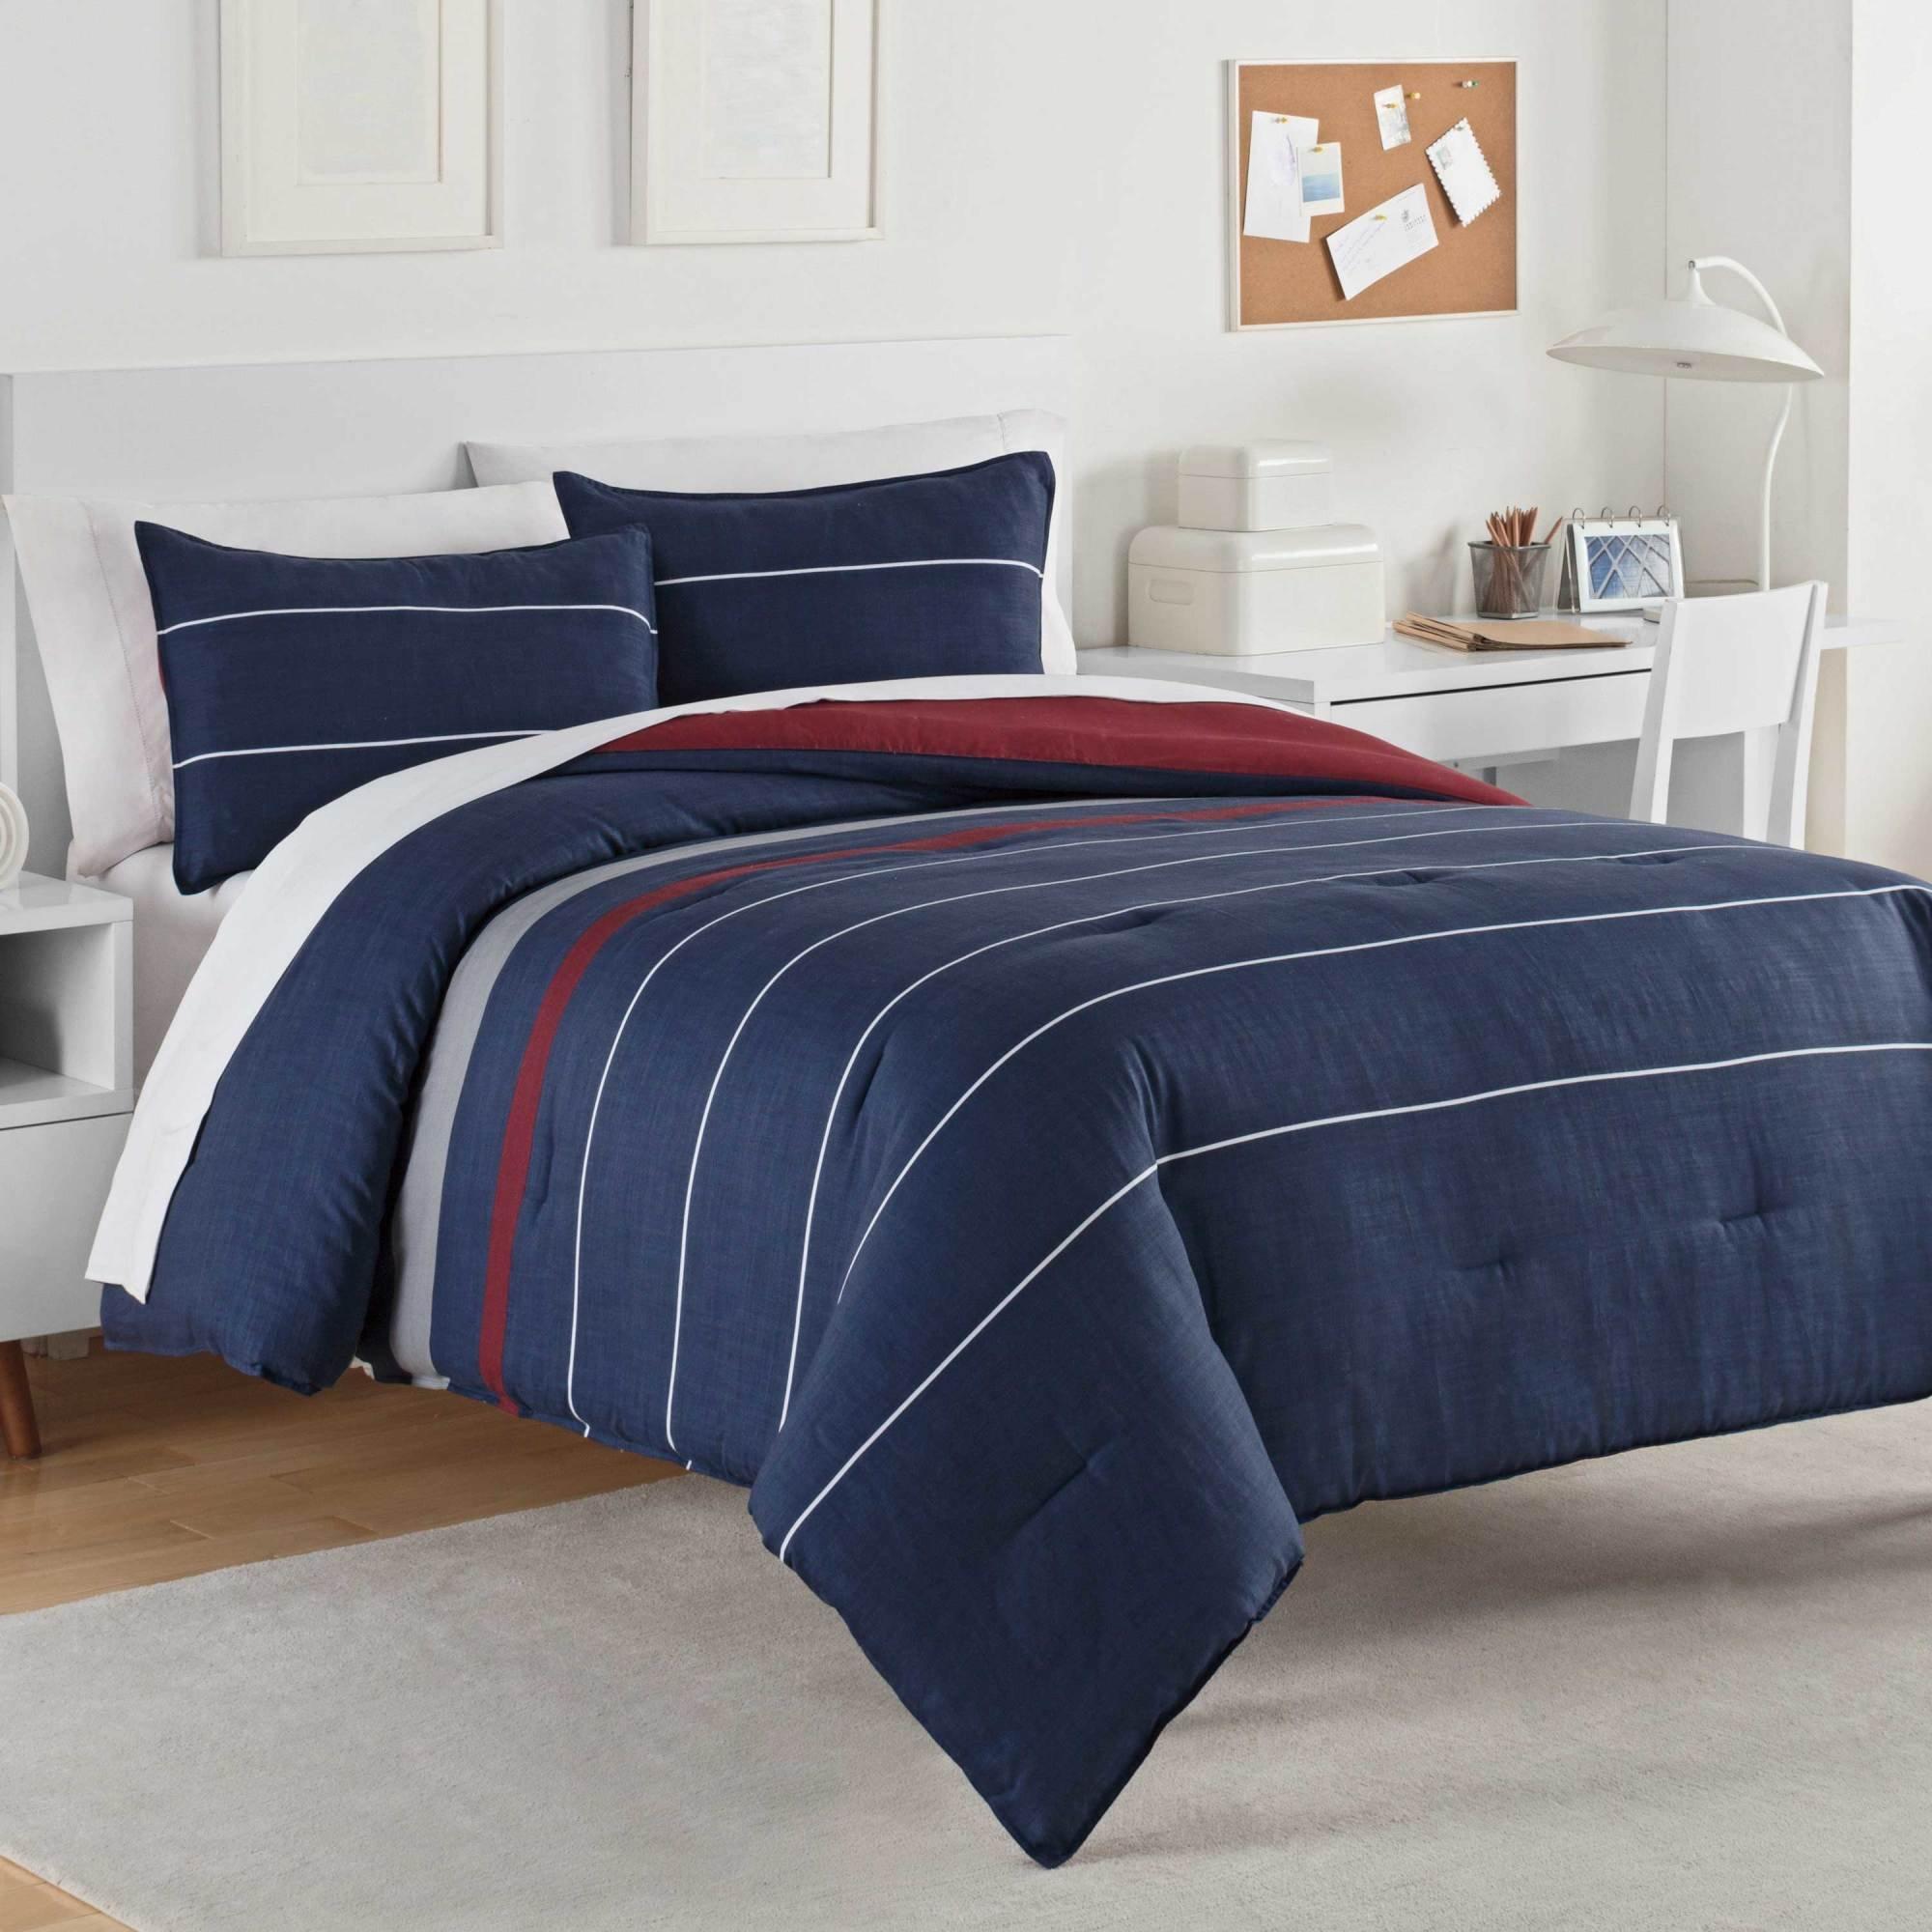 IZOD Jackson Comforter Set, Twin/Twin XL, Blue